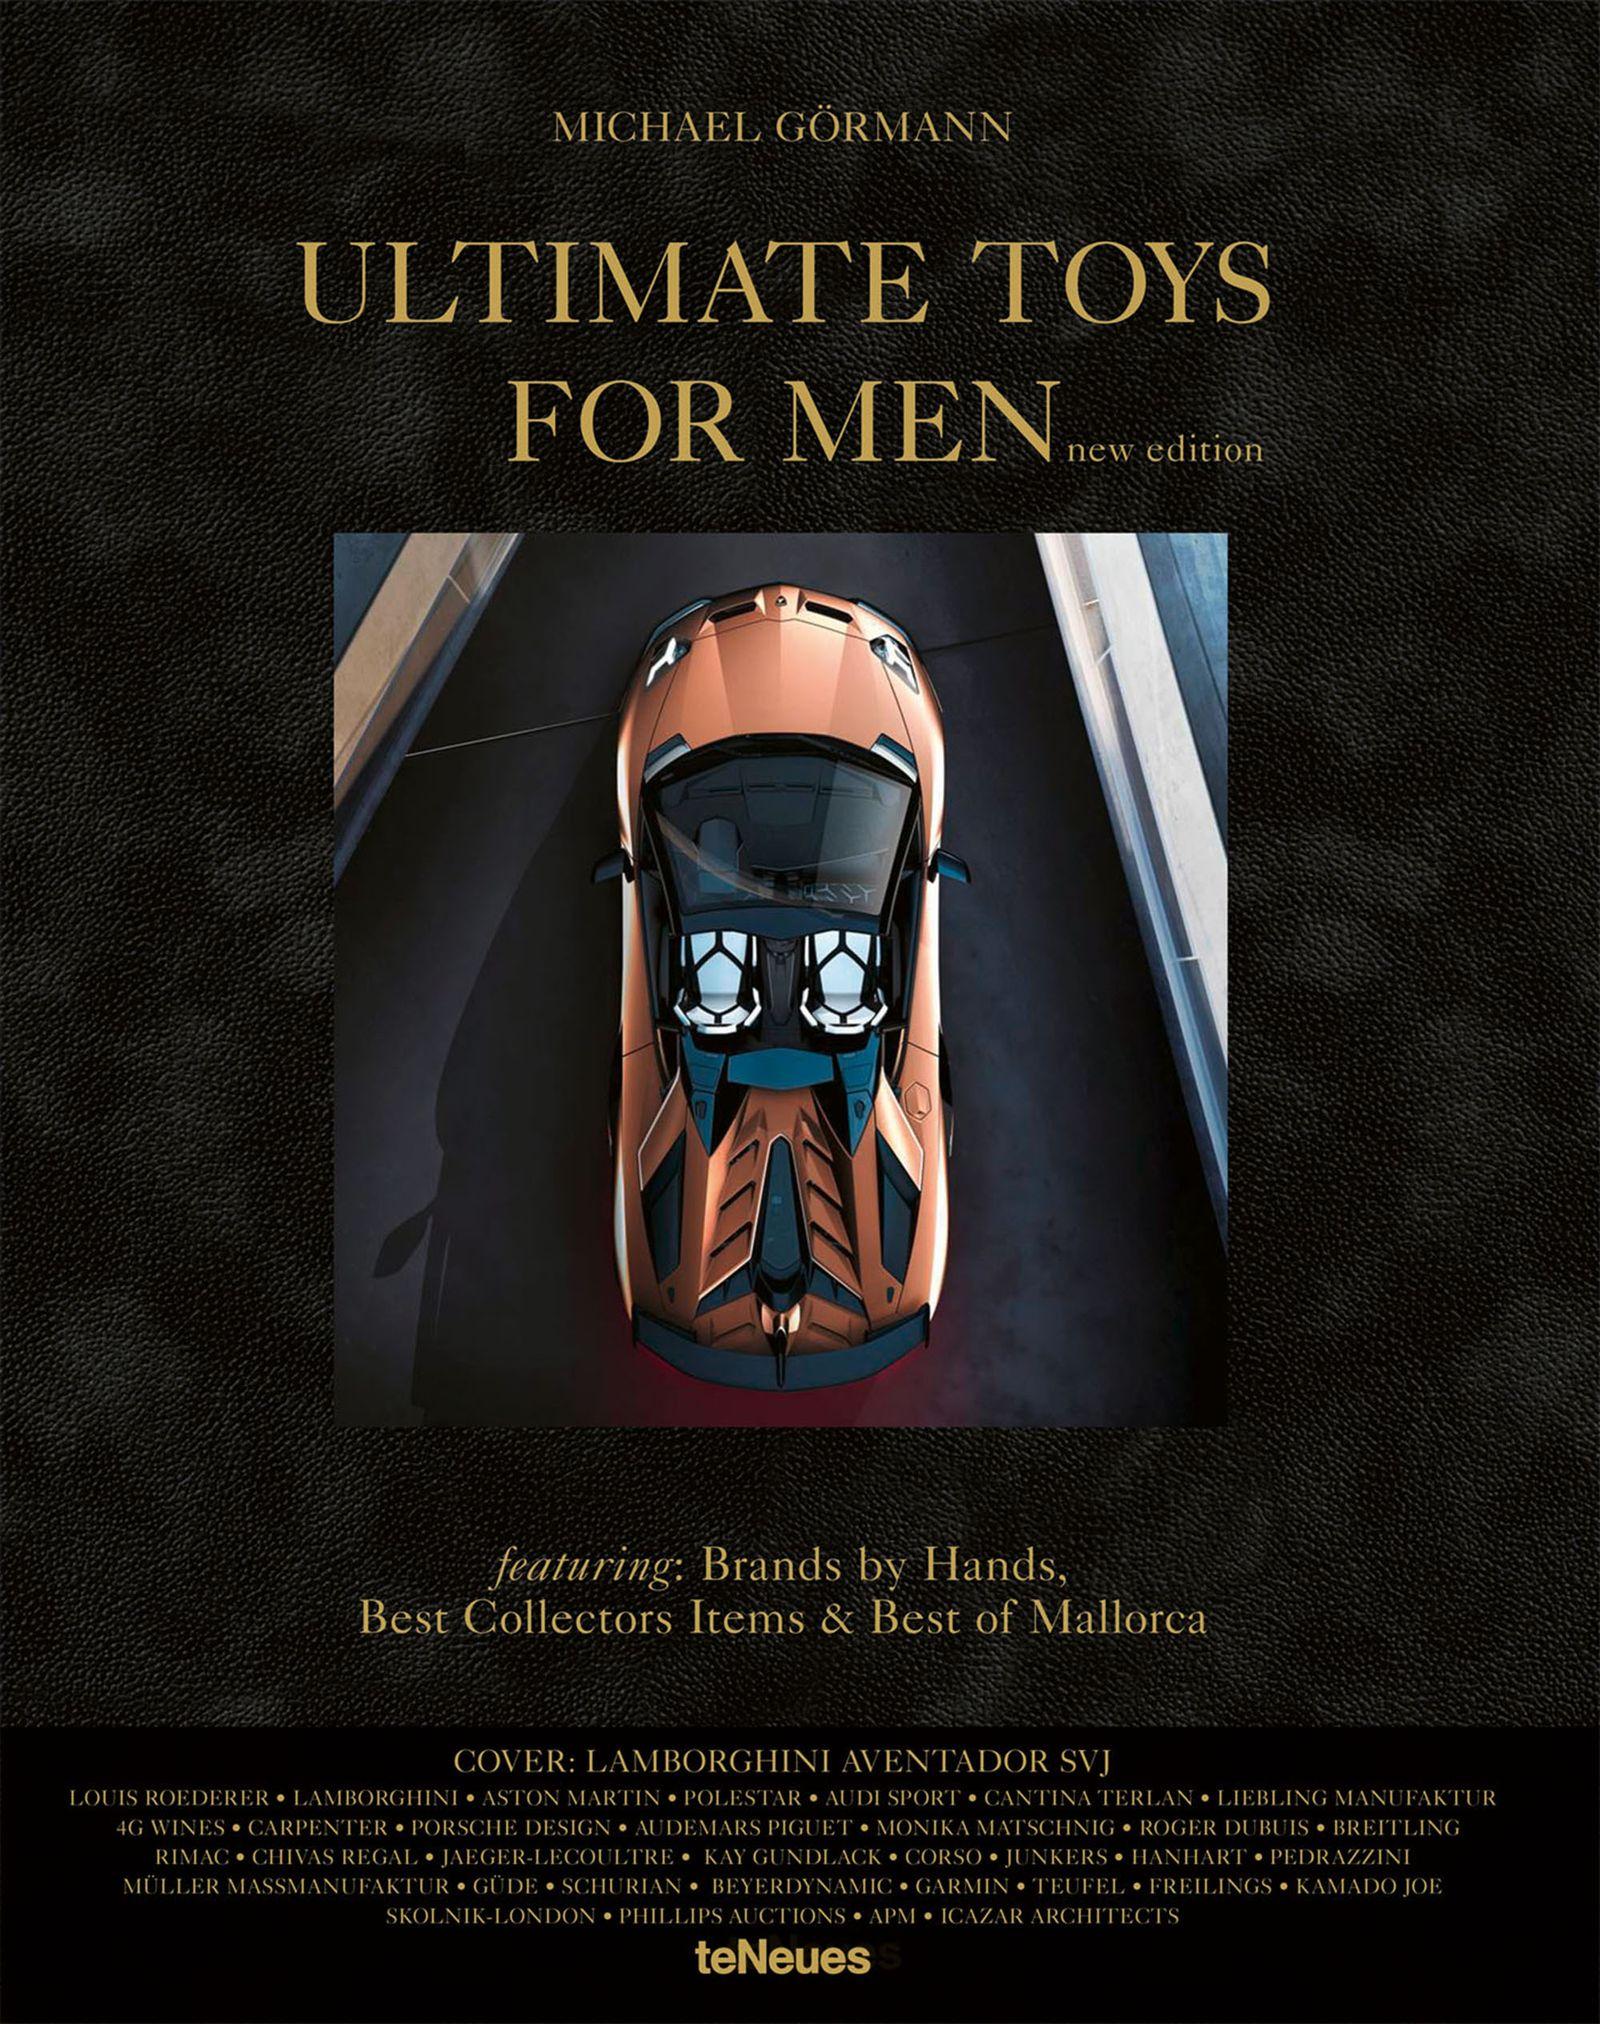 Stil/ Ultimate Toys for Men - New Edition COVER